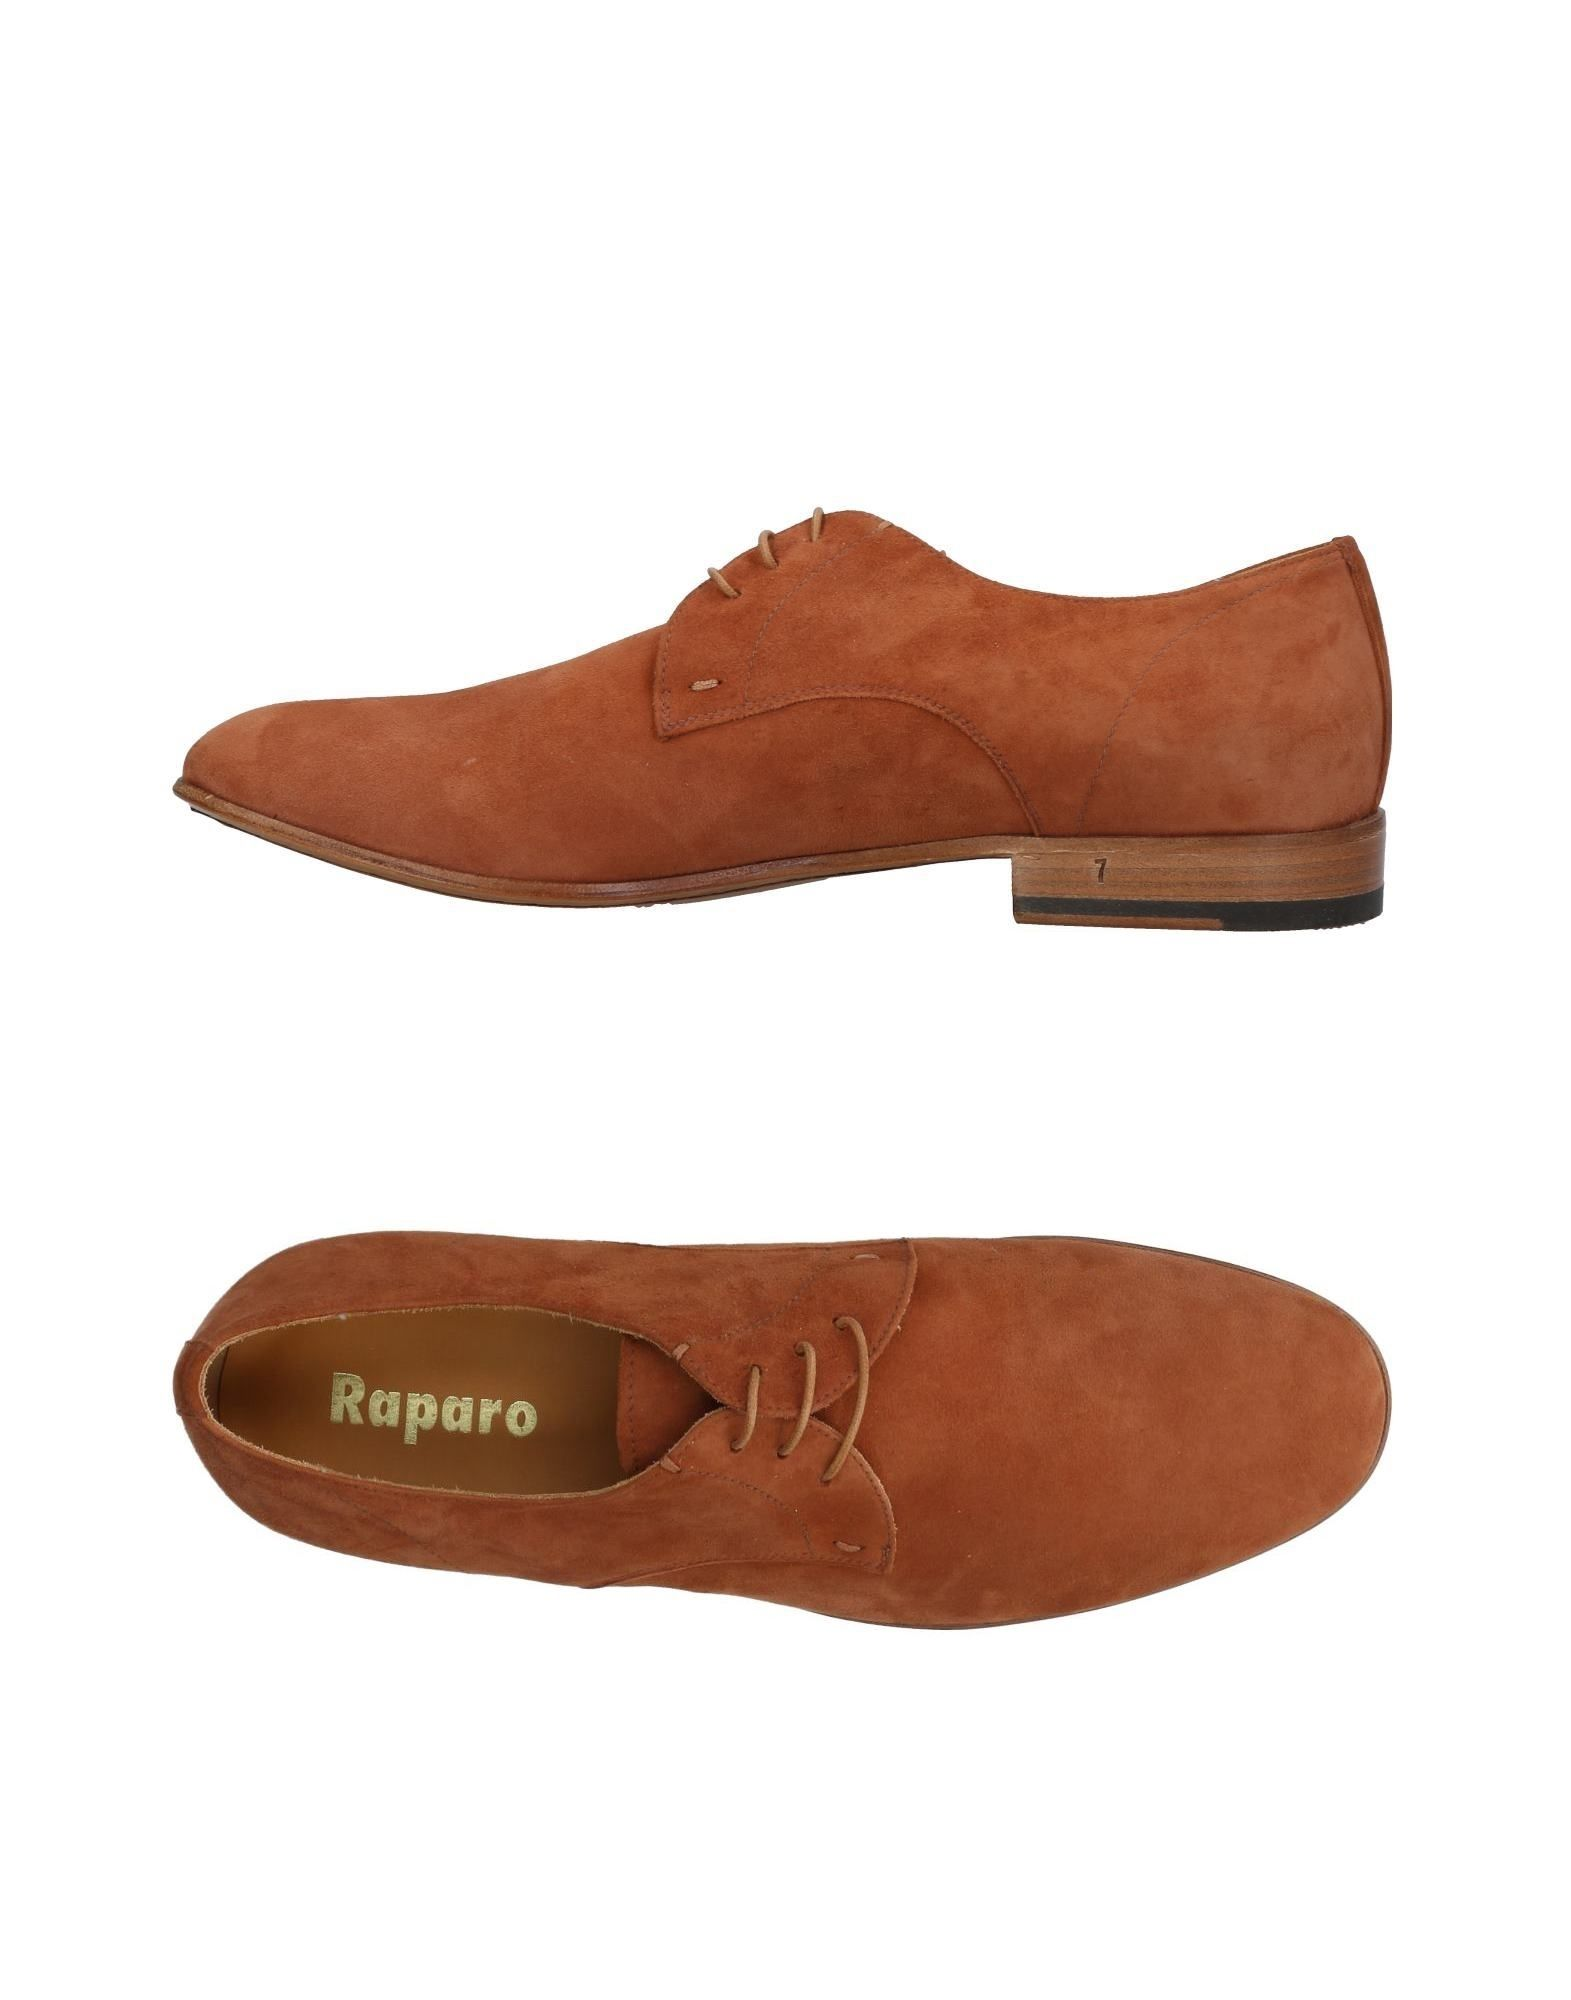 Raparo Schnürschuhe Schuhe Herren  11419776EJ Heiße Schuhe Schnürschuhe c6f3e5